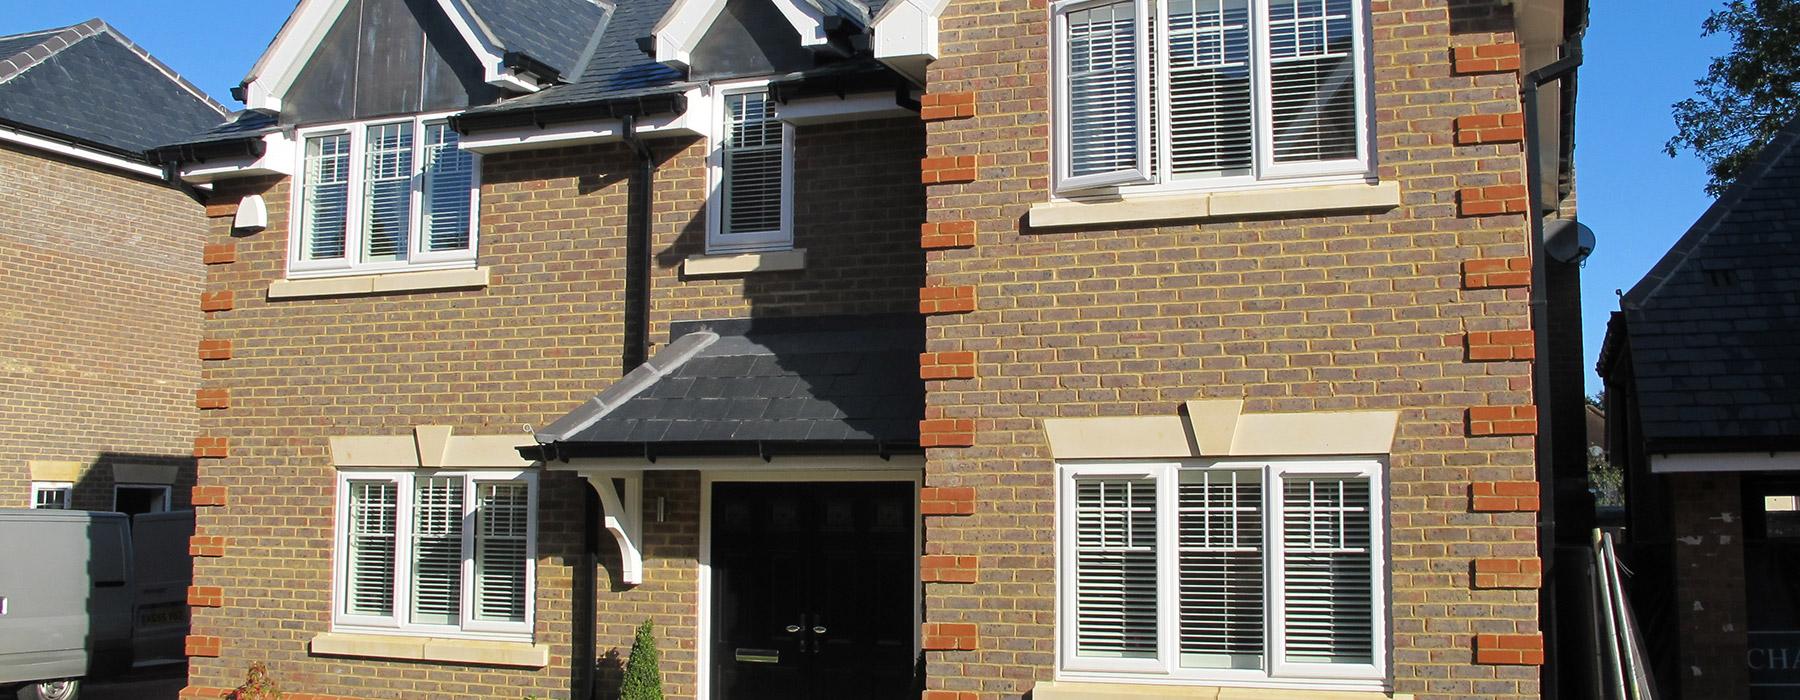 Oxfordshire casement windows